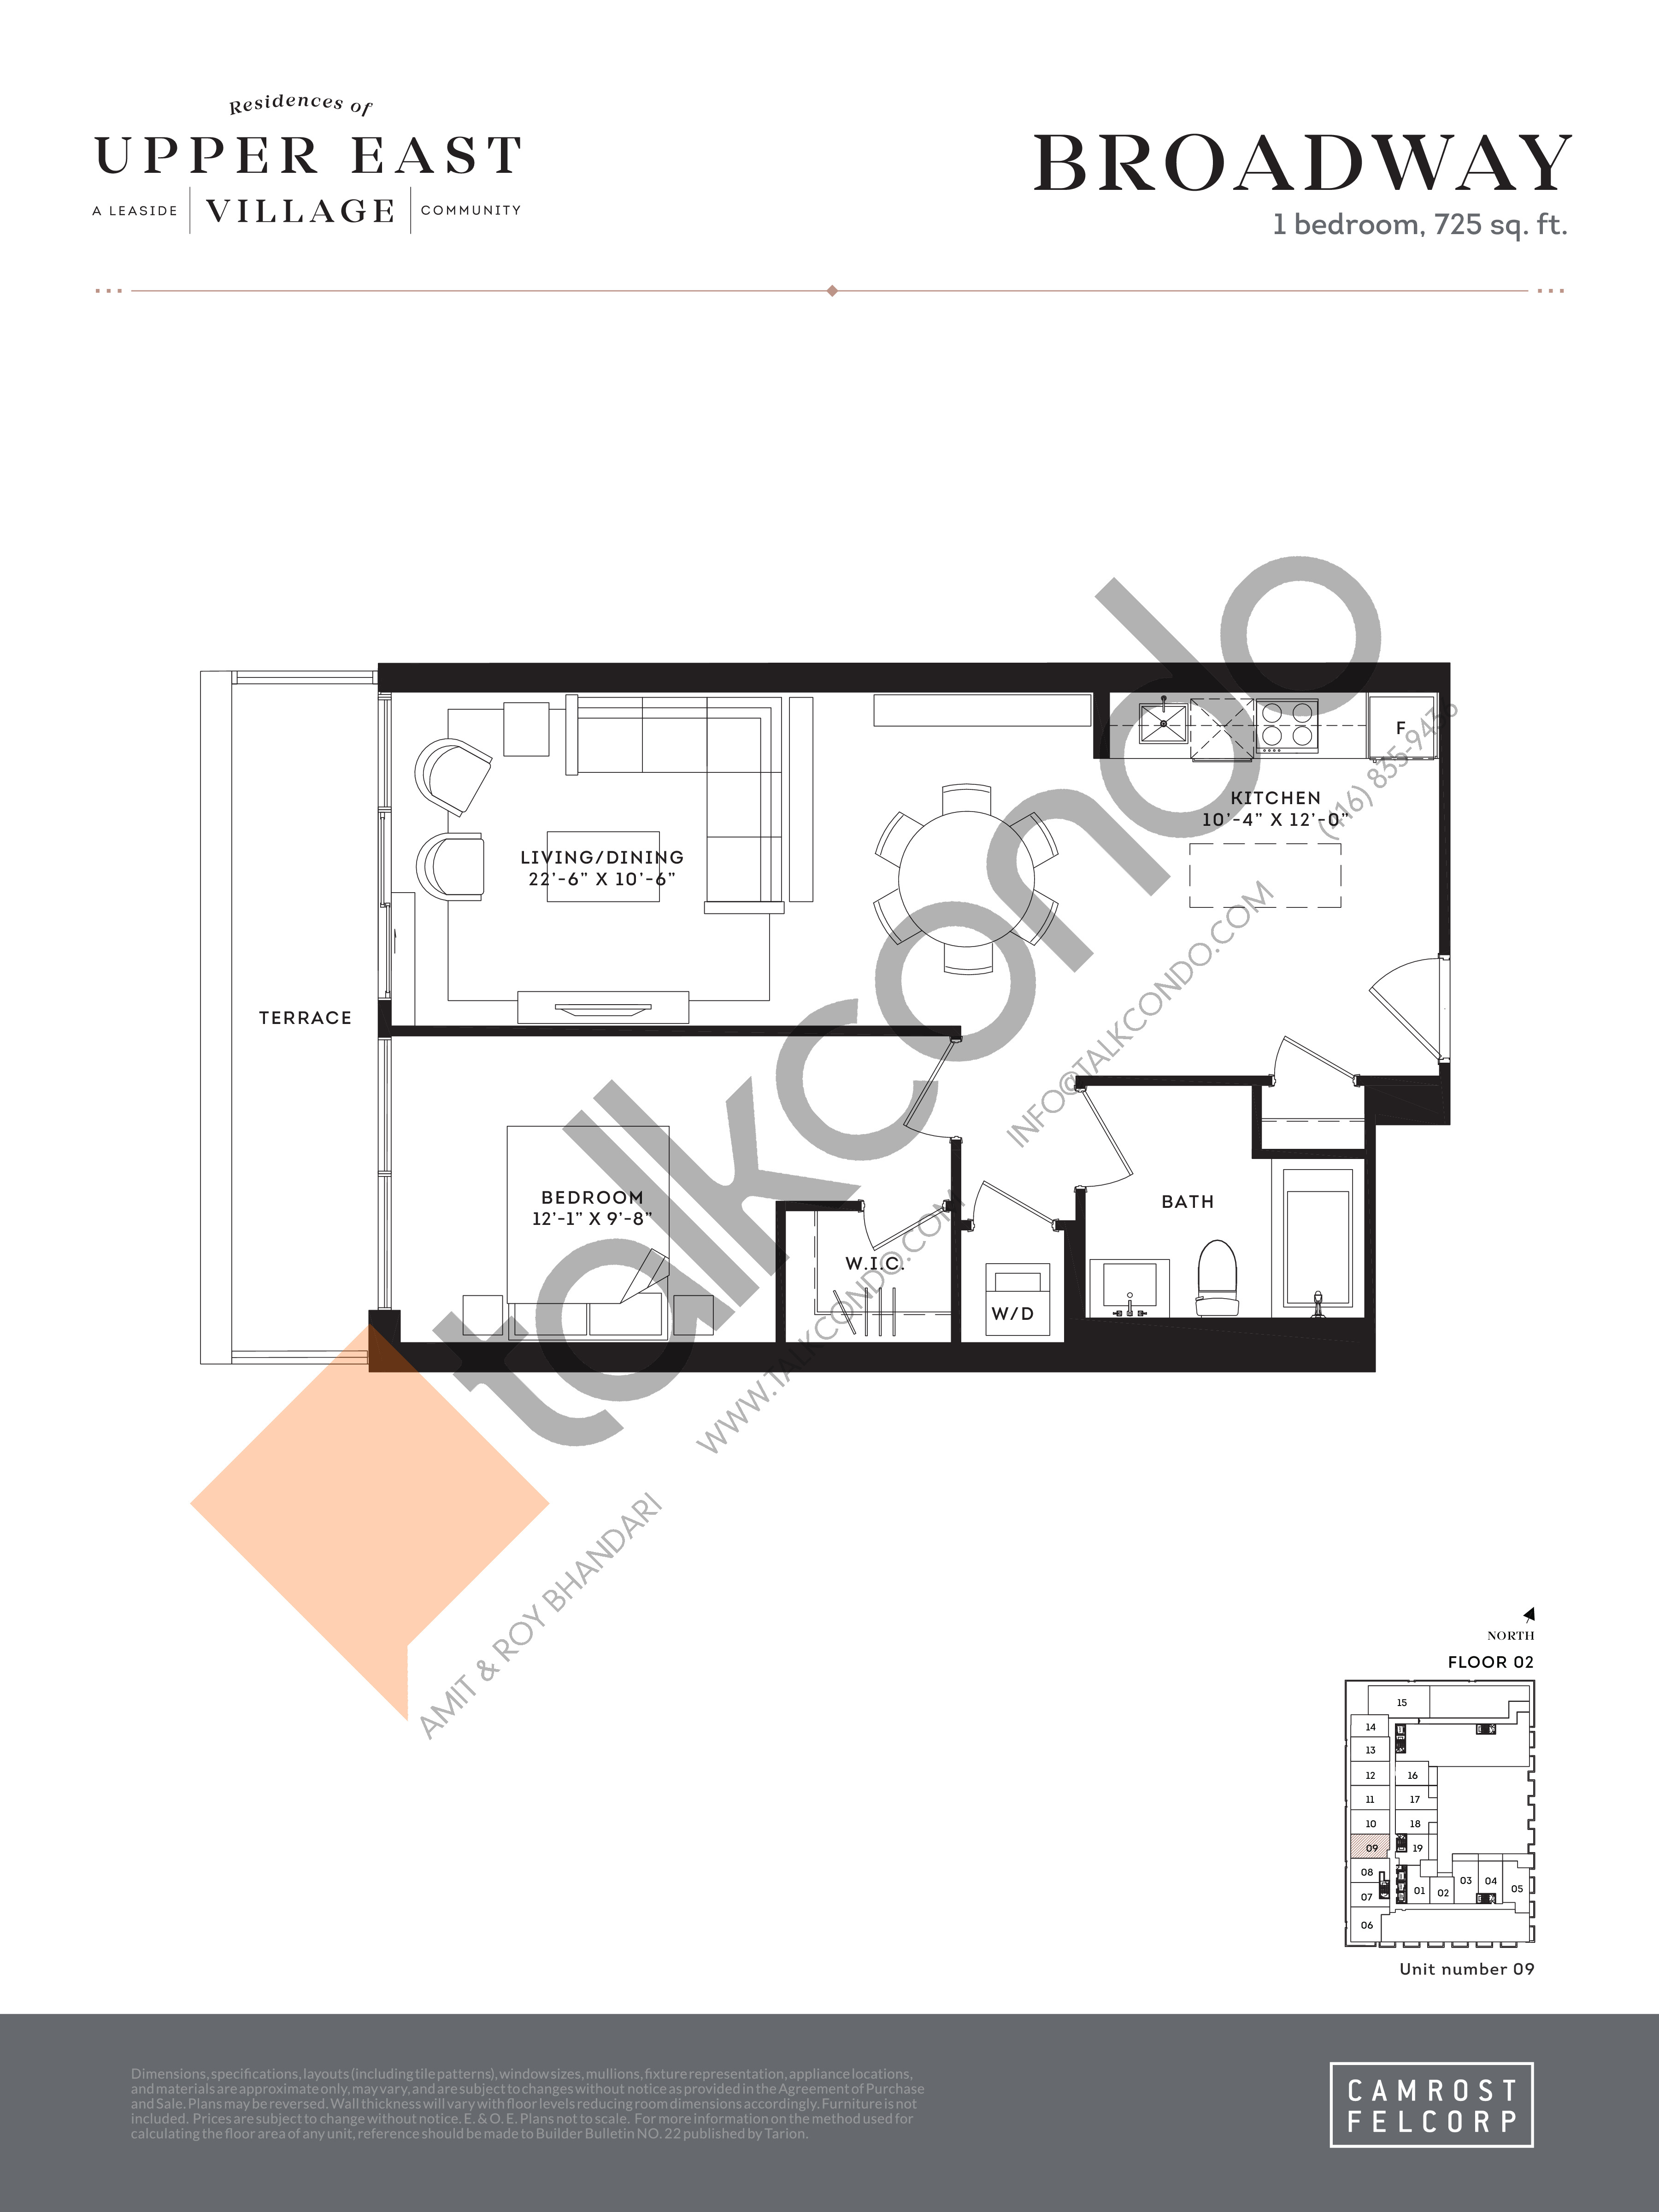 Broadway Floor Plan at Upper East Village Condos - 725 sq.ft